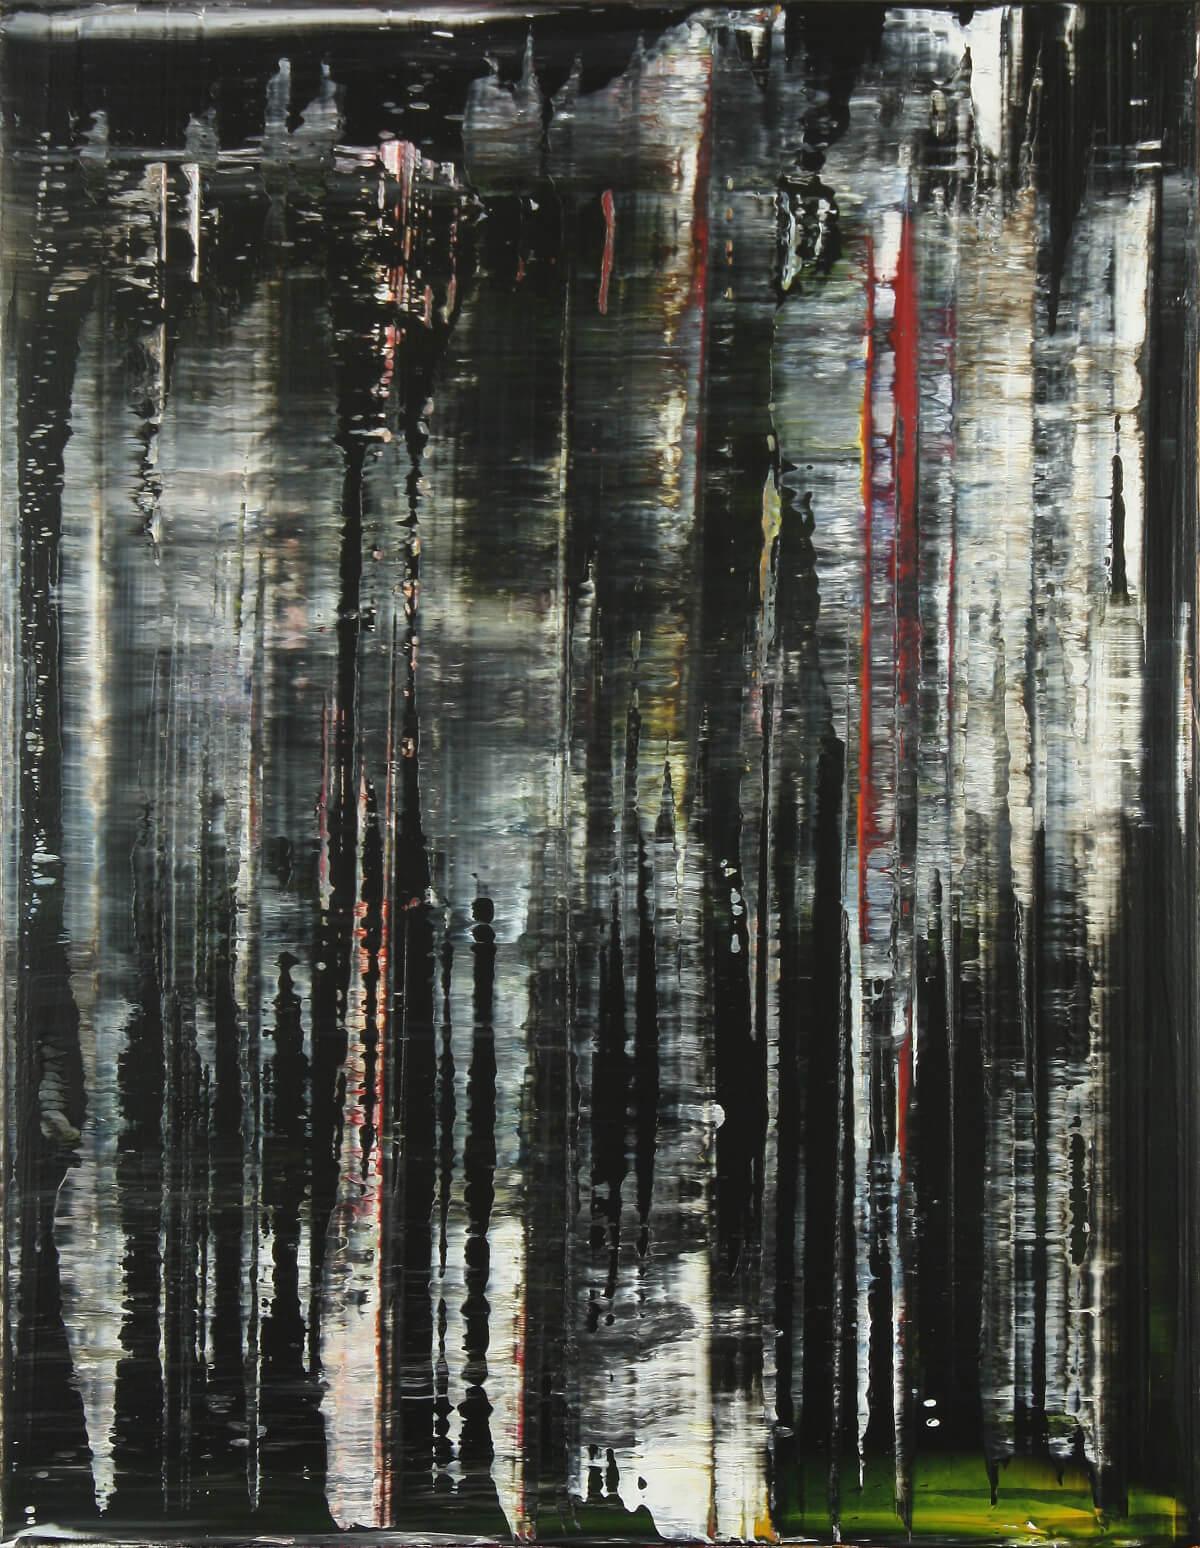 Streifen, 2017, acrylic on canvas, 70x90cm